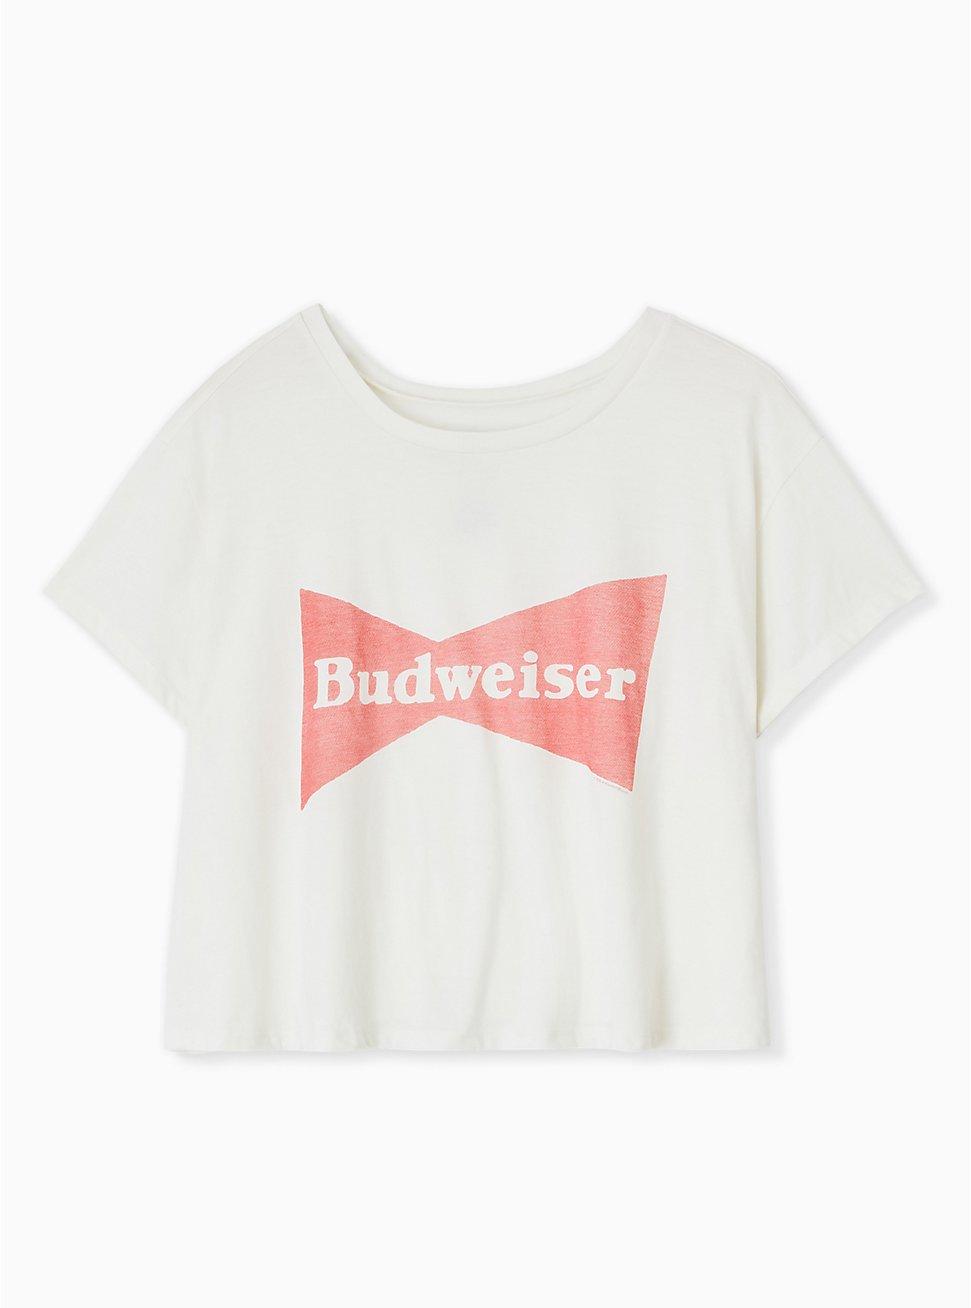 Budweiser Crop Crew Tee - Ivory, BRIGHT WHITE, hi-res